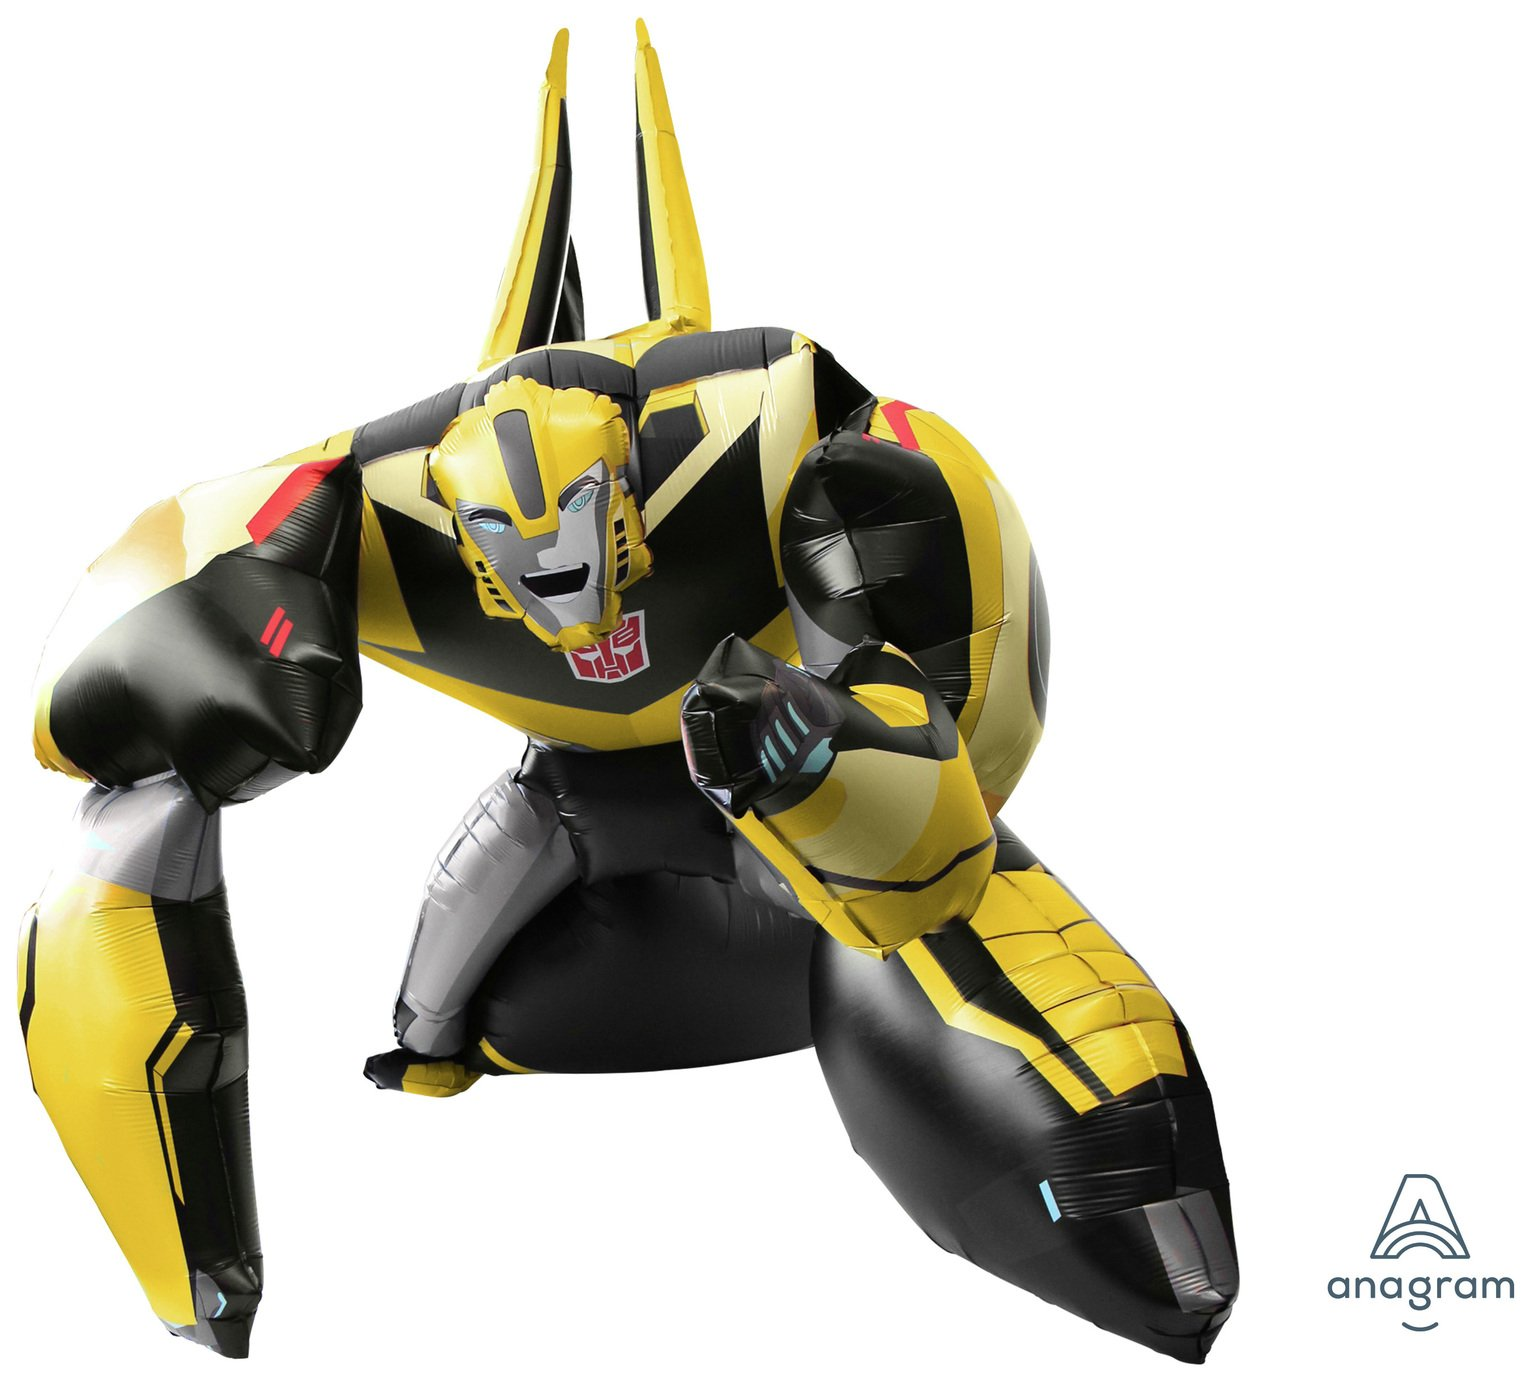 Hasbro Transformers Bumblebee Airwalker